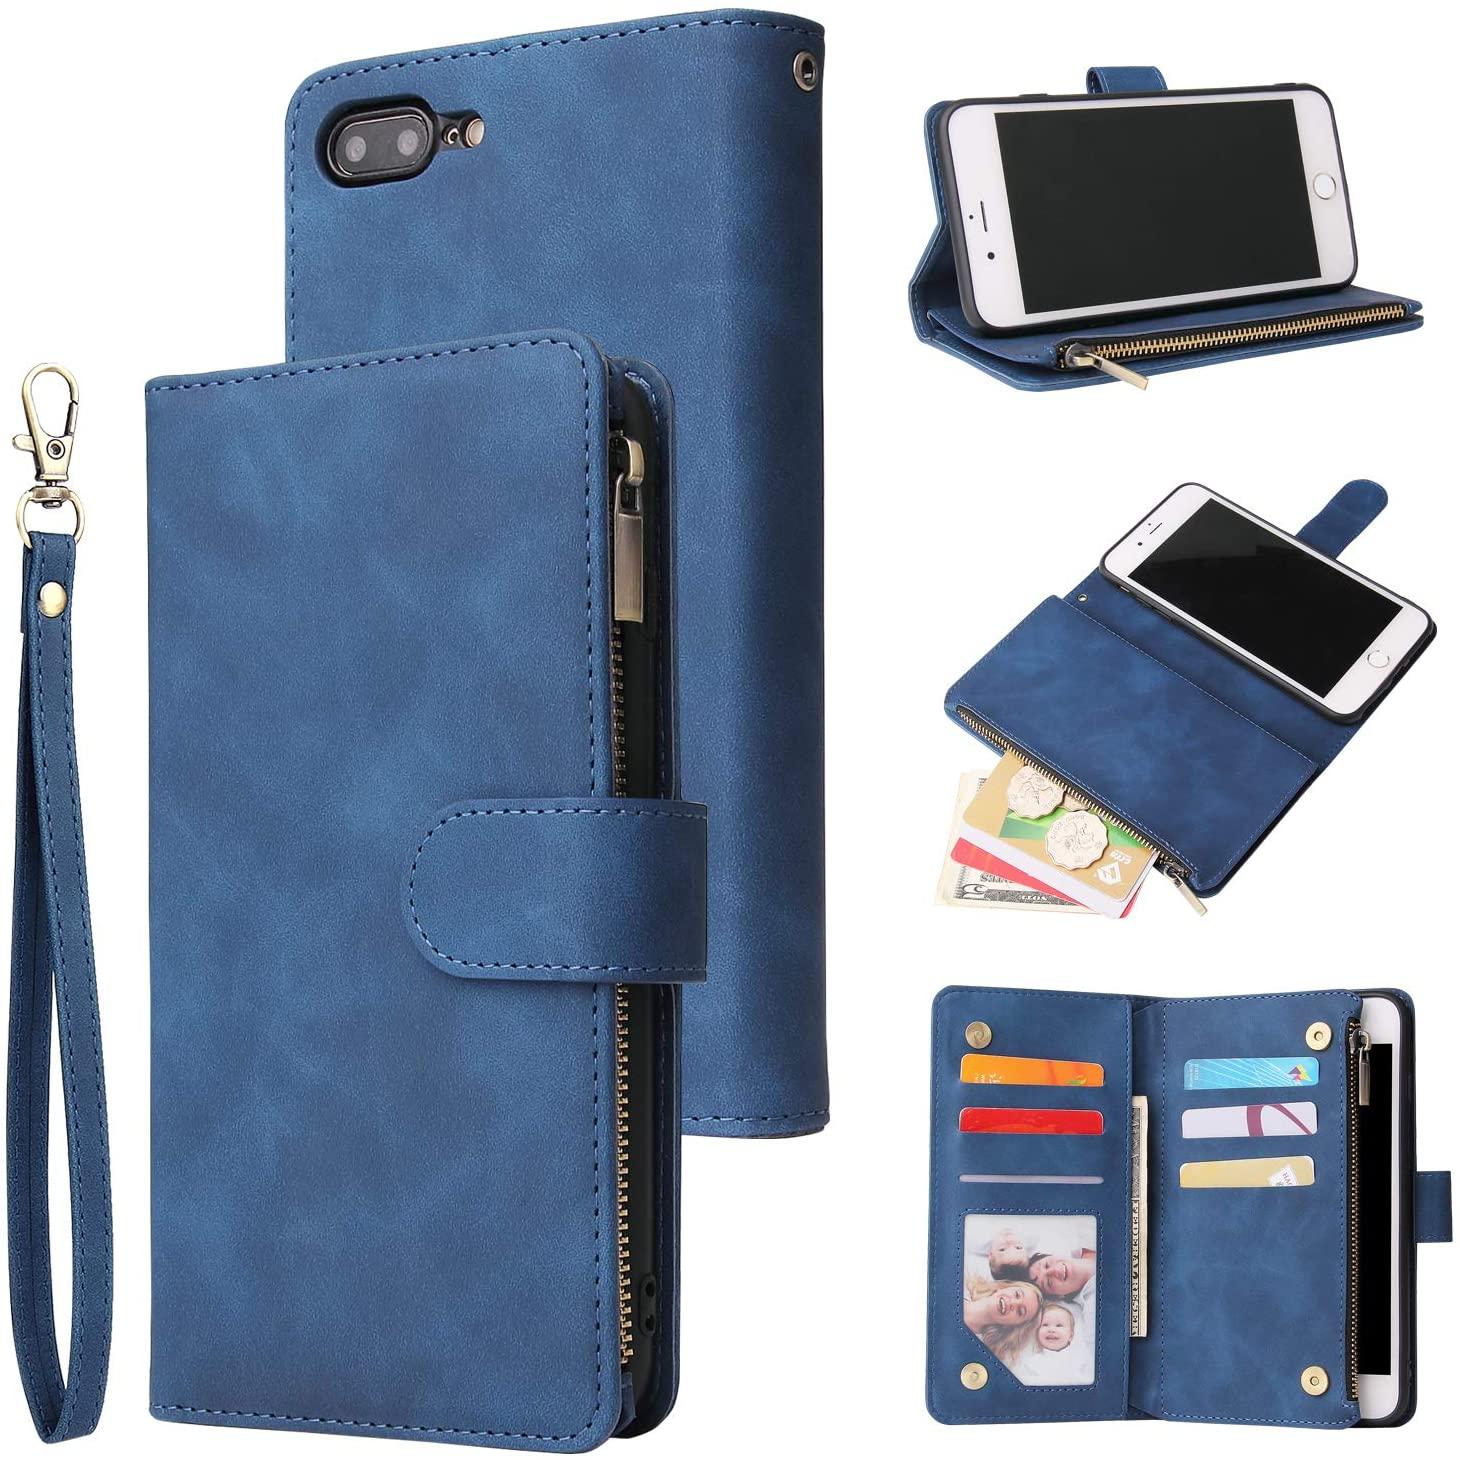 UEEBAI Wallet Case for iPhone SE 2020 iPhone 7 iPhone 8, Premium Vintage PU Leather Magnetic Closure Handbag Zipper Pocket Case Kickstand Card Holder Slots with Wrist Strap TPU Shockproof Flip - Blue